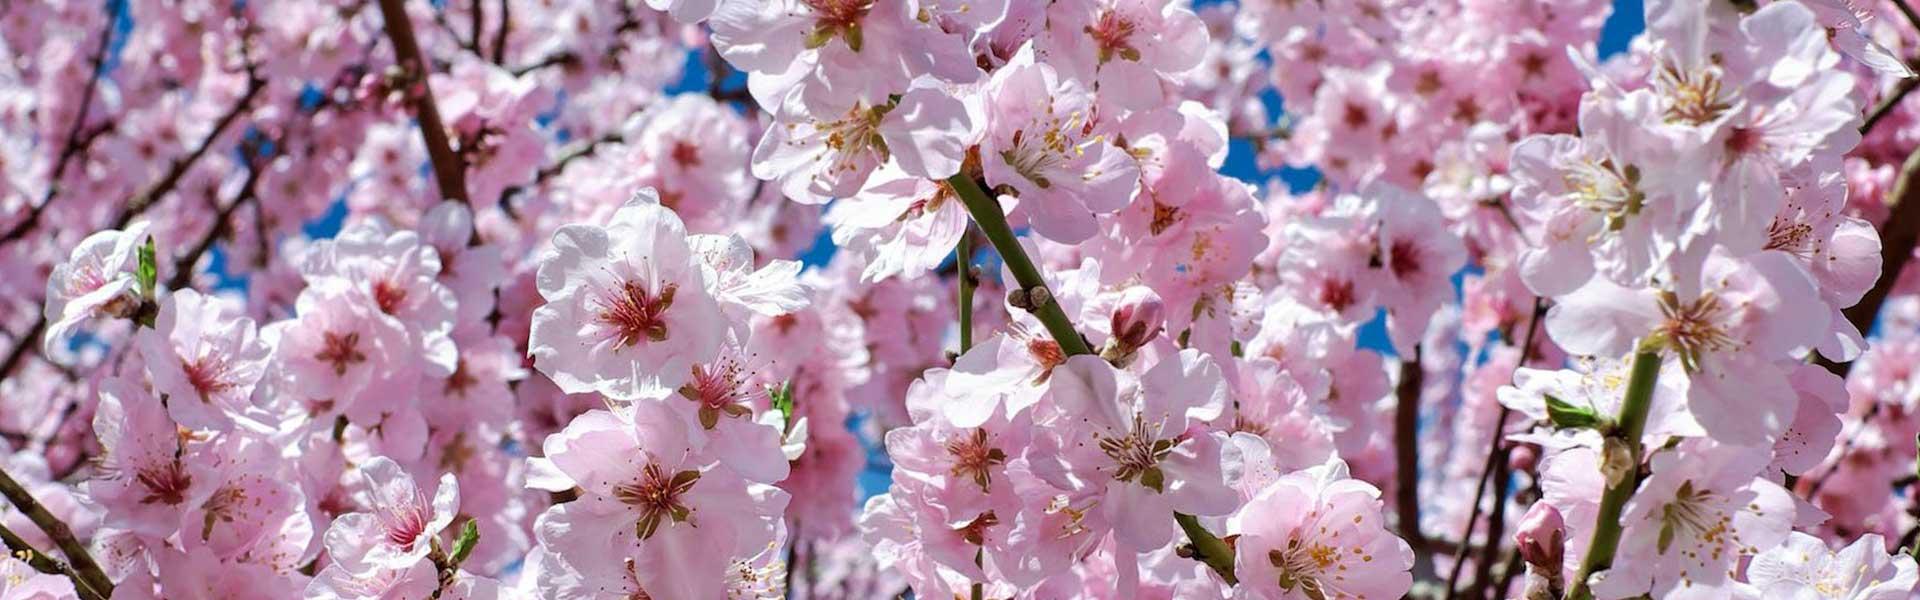 cherry tree in flower